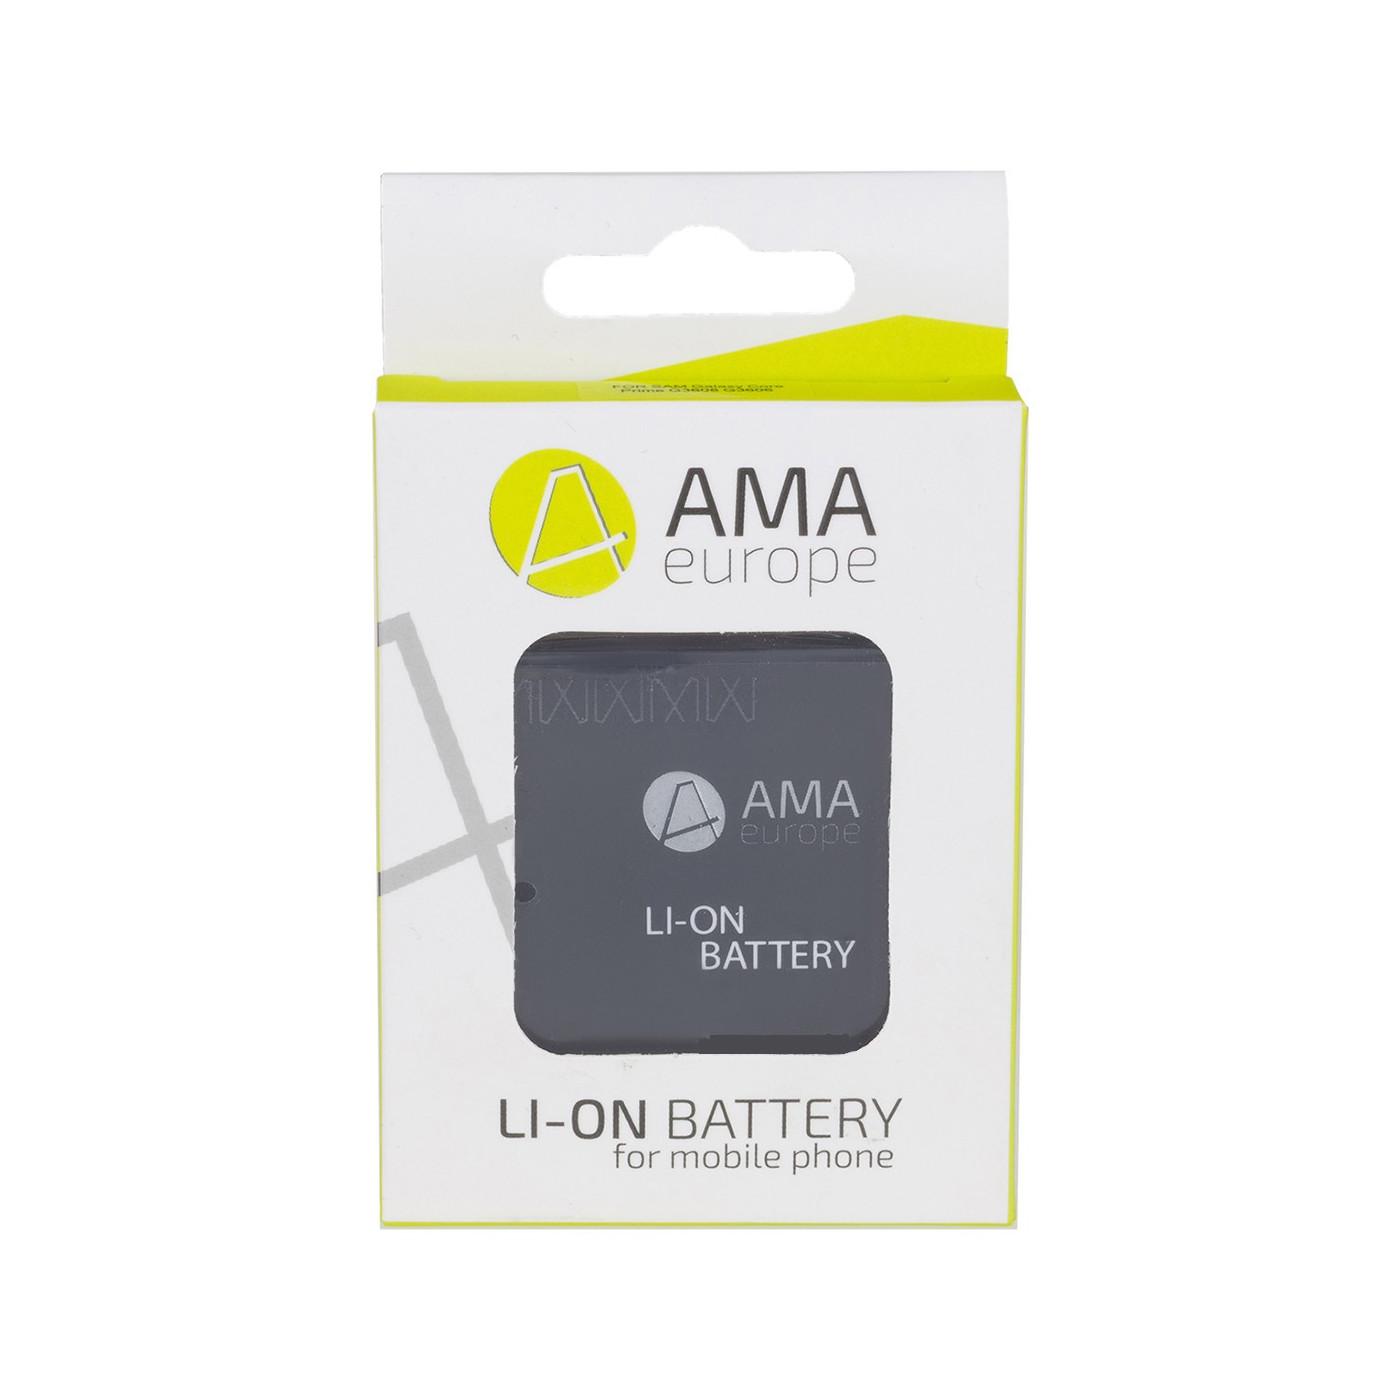 AMA Akku für LG L5 2 1700 mAh in hoher Qualität